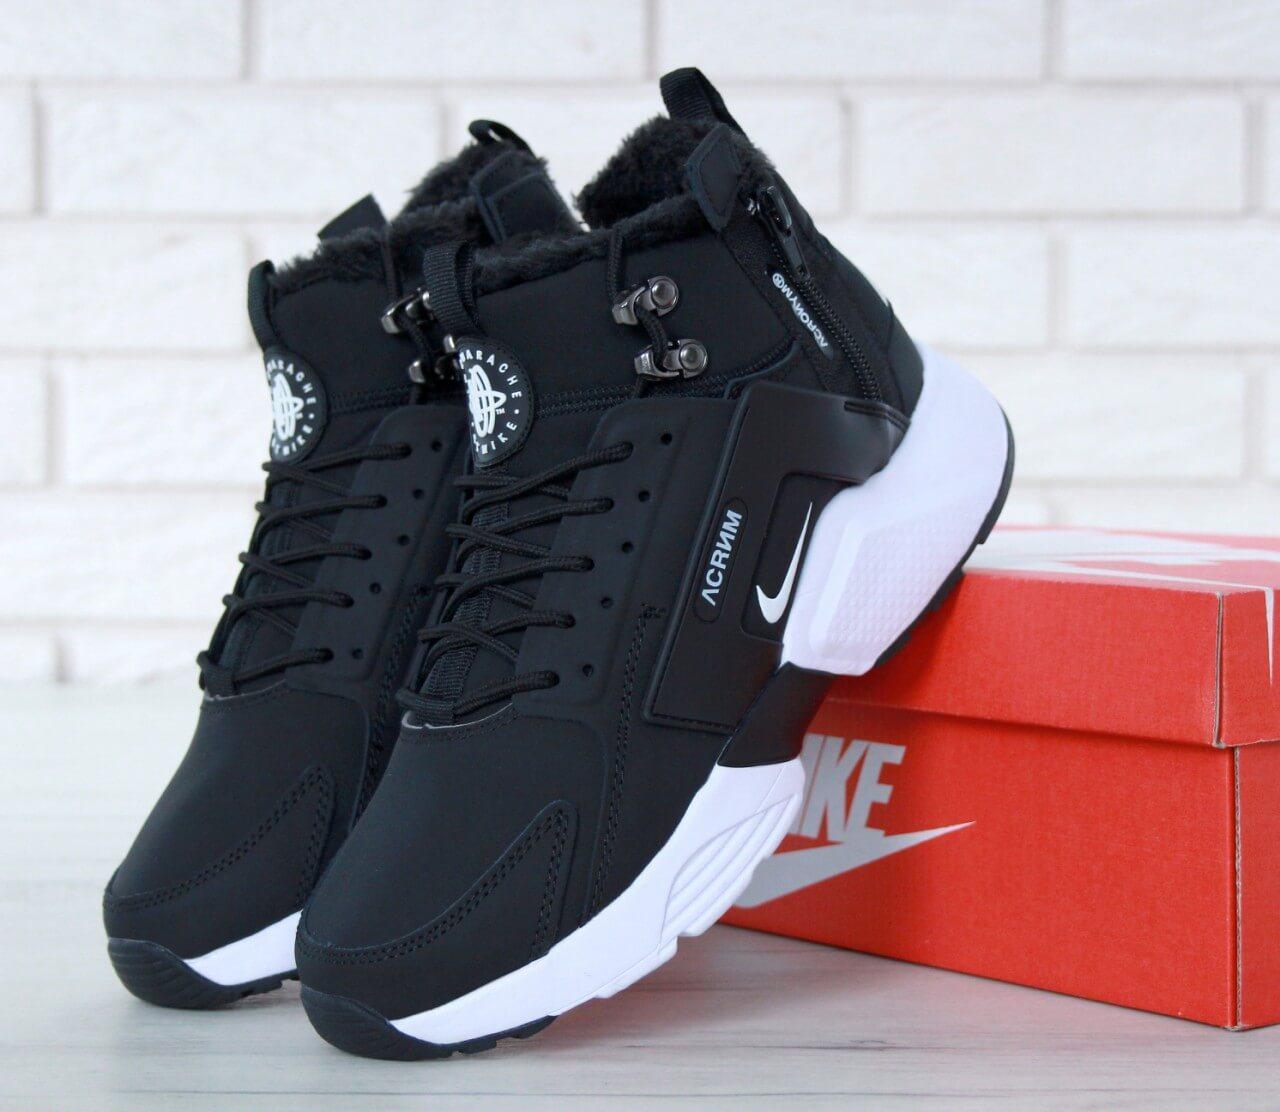 Мужские зимние кроссовки на меху Nike Huarache X Acronym City Winter Black White